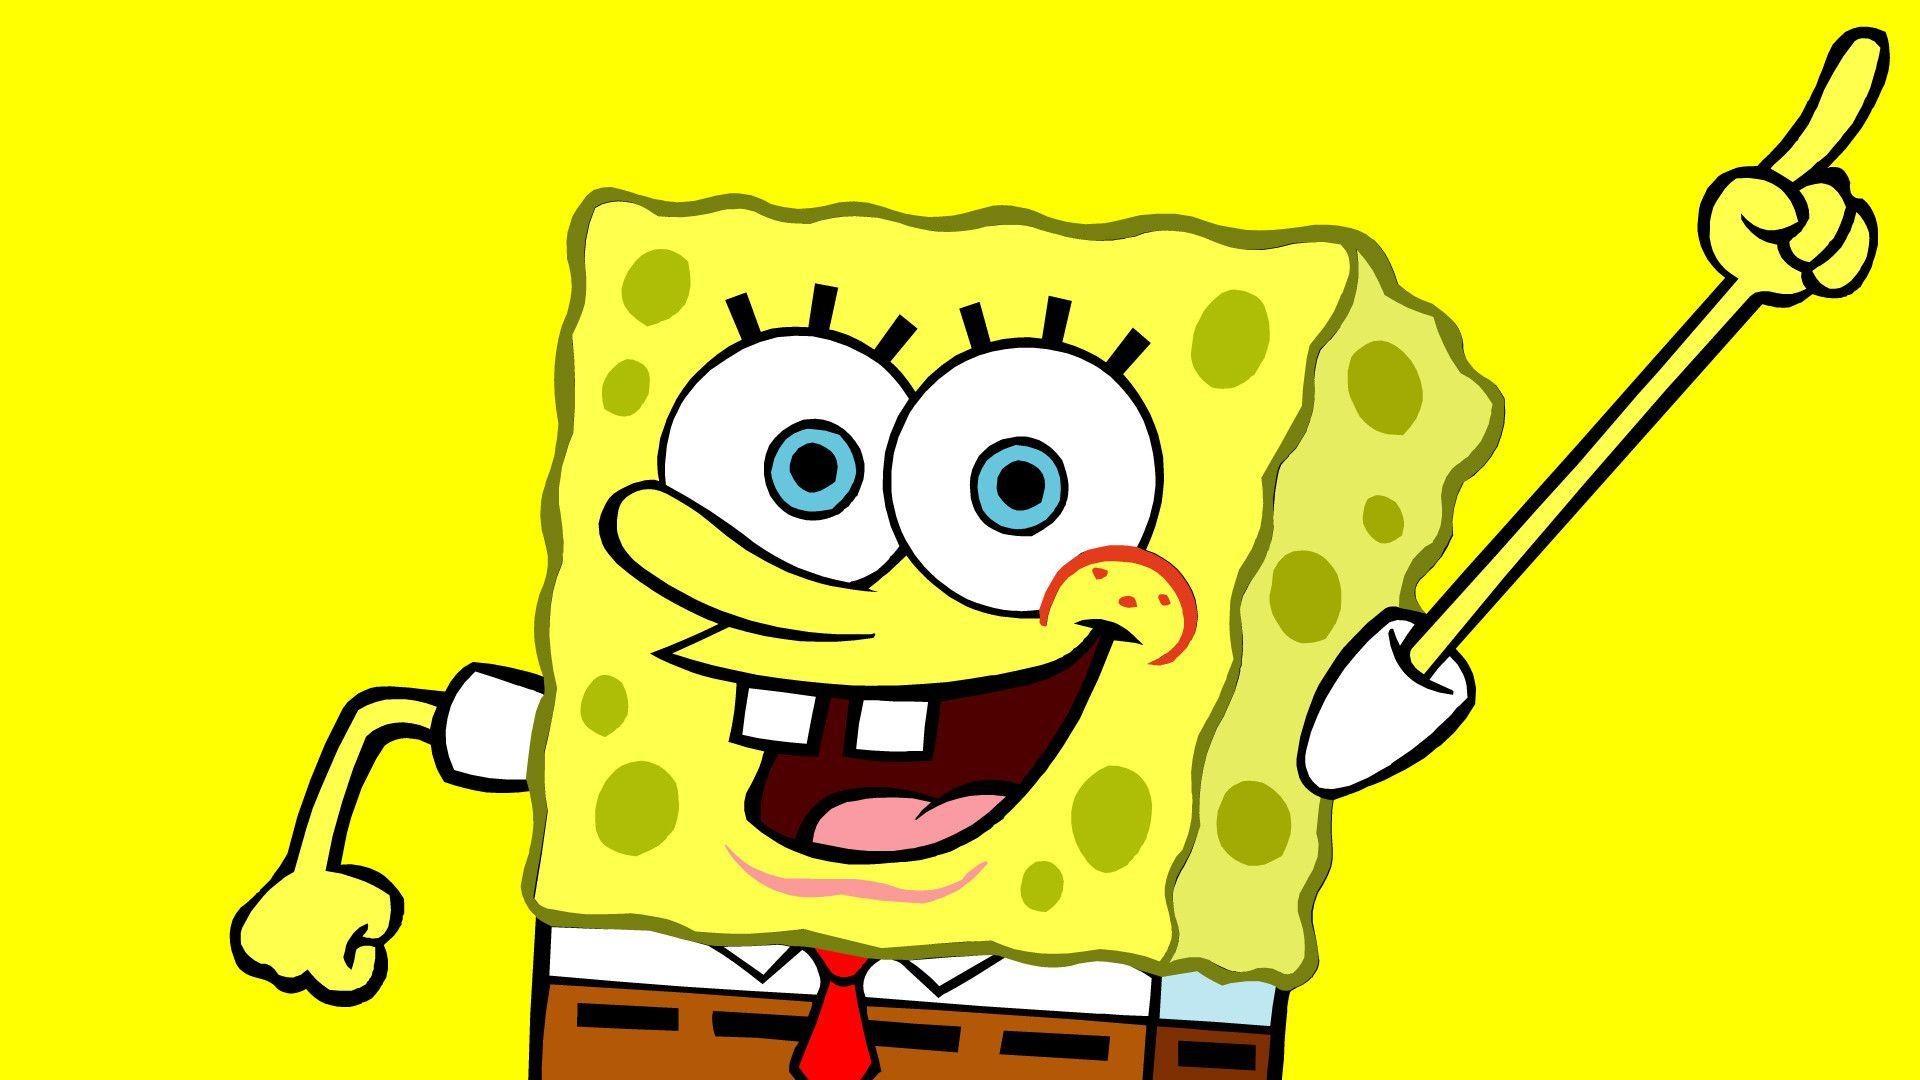 Spongebob | Cartoons HD 4k Wallpapers